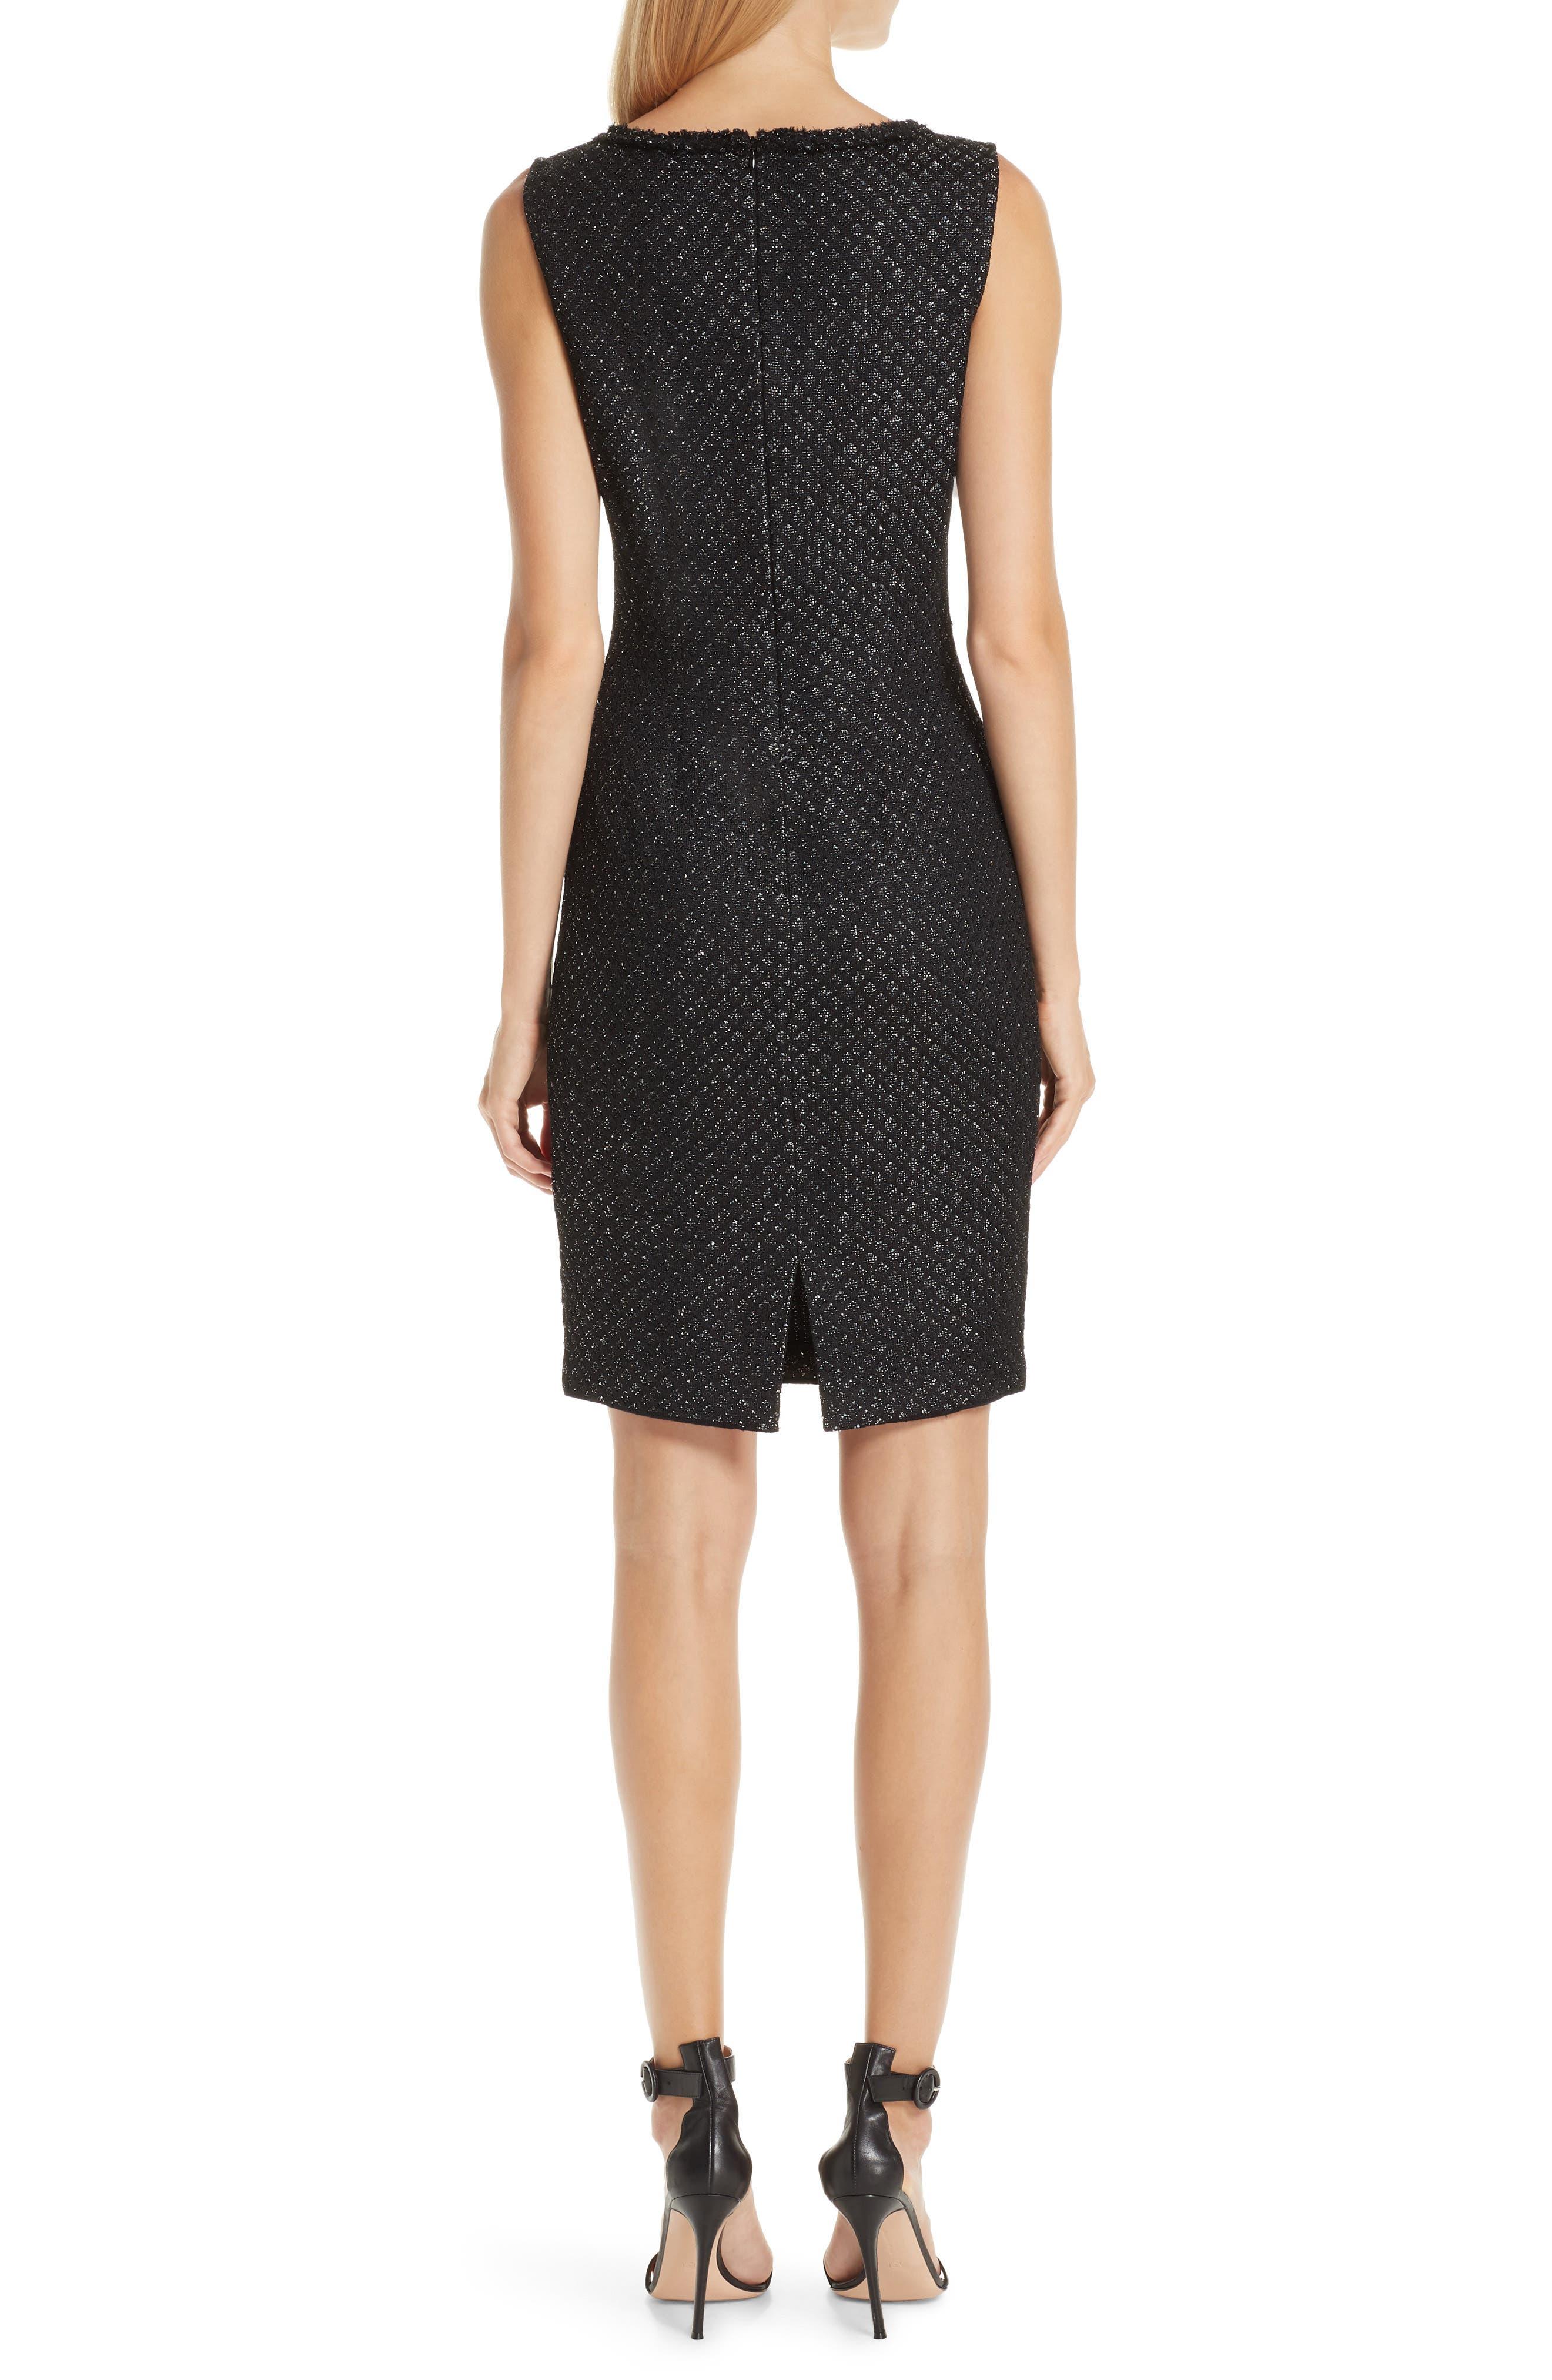 ST. JOHN COLLECTION, Shimmer Inlay Brocade Knit Dress, Alternate thumbnail 2, color, CAVIAR/ SILVER